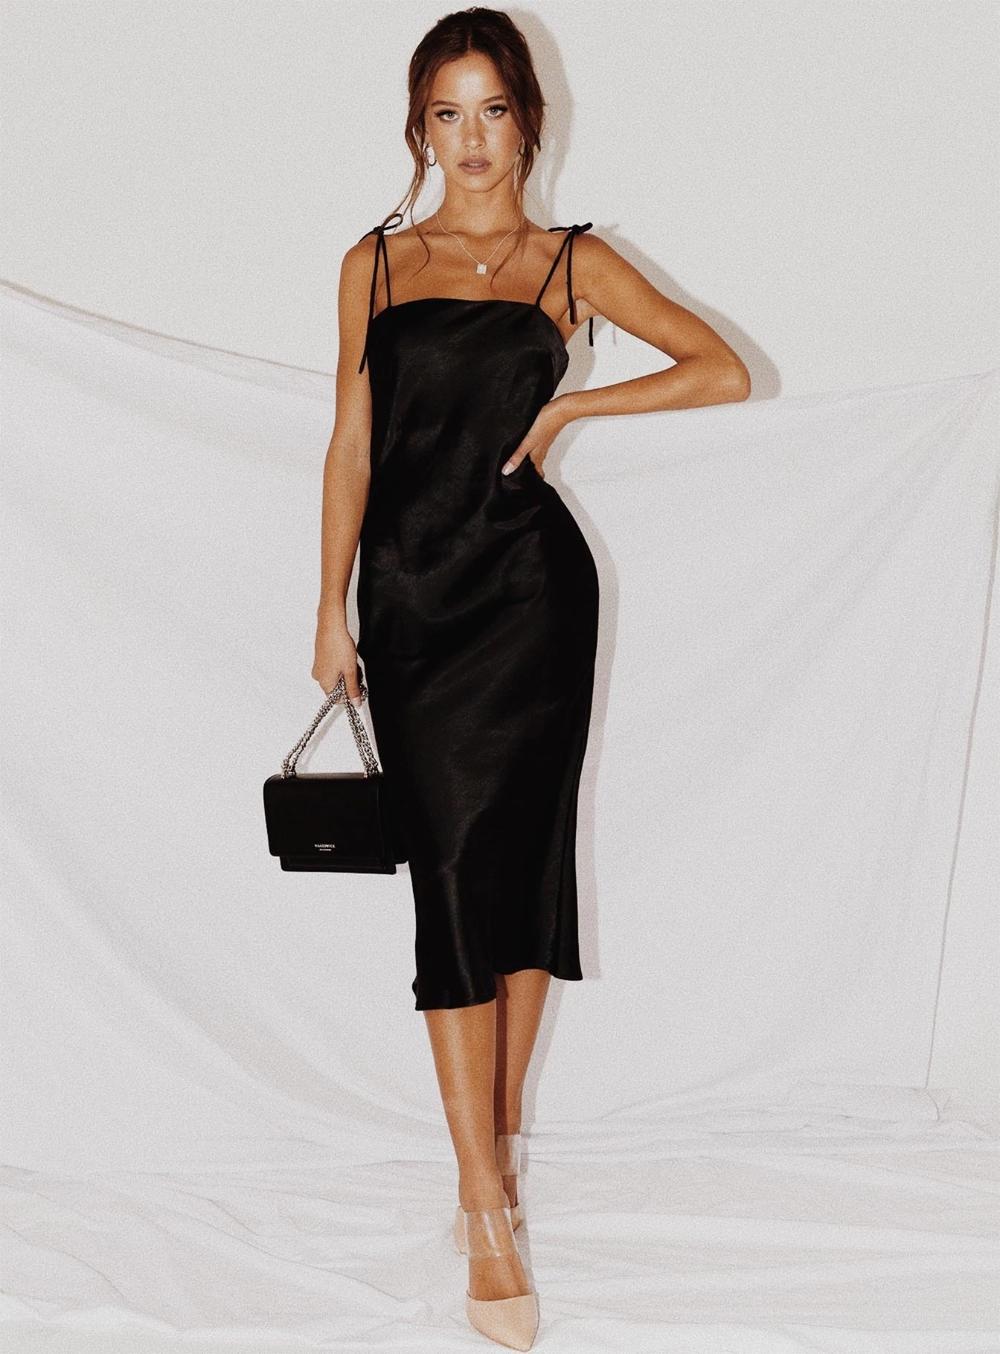 Elan Silky Midi Dress Black Silky Maxi Dress Black Midi Dress Midi Dress Winter [ 1354 x 1000 Pixel ]